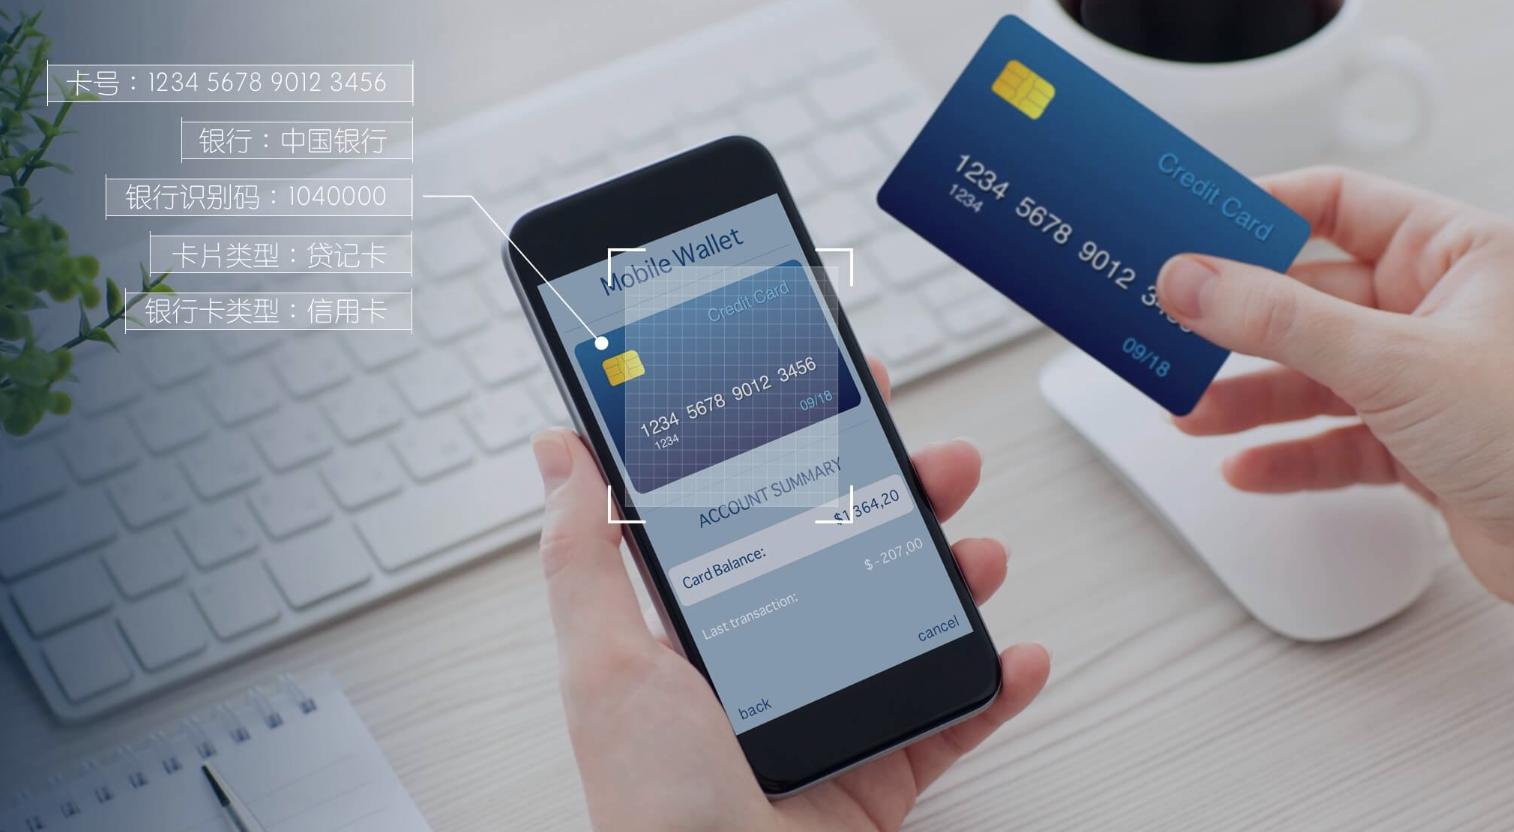 OCR识别技术金融领域应用之身份实名认证:身份证识别OCR+人脸识别